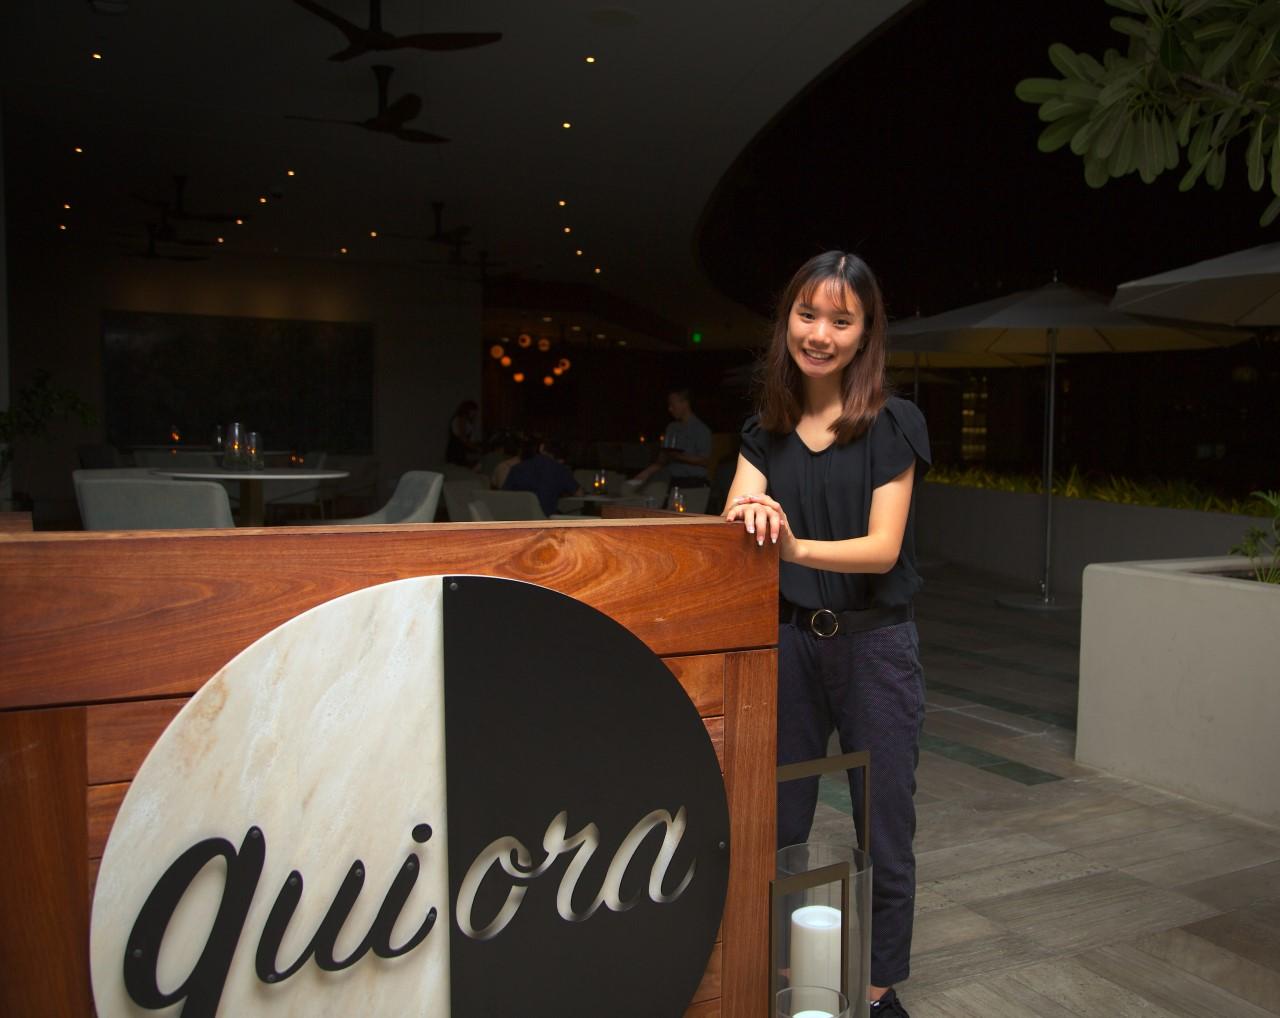 Jade Frank at her job at the Ritz Carlton Hotel in Waikiki.